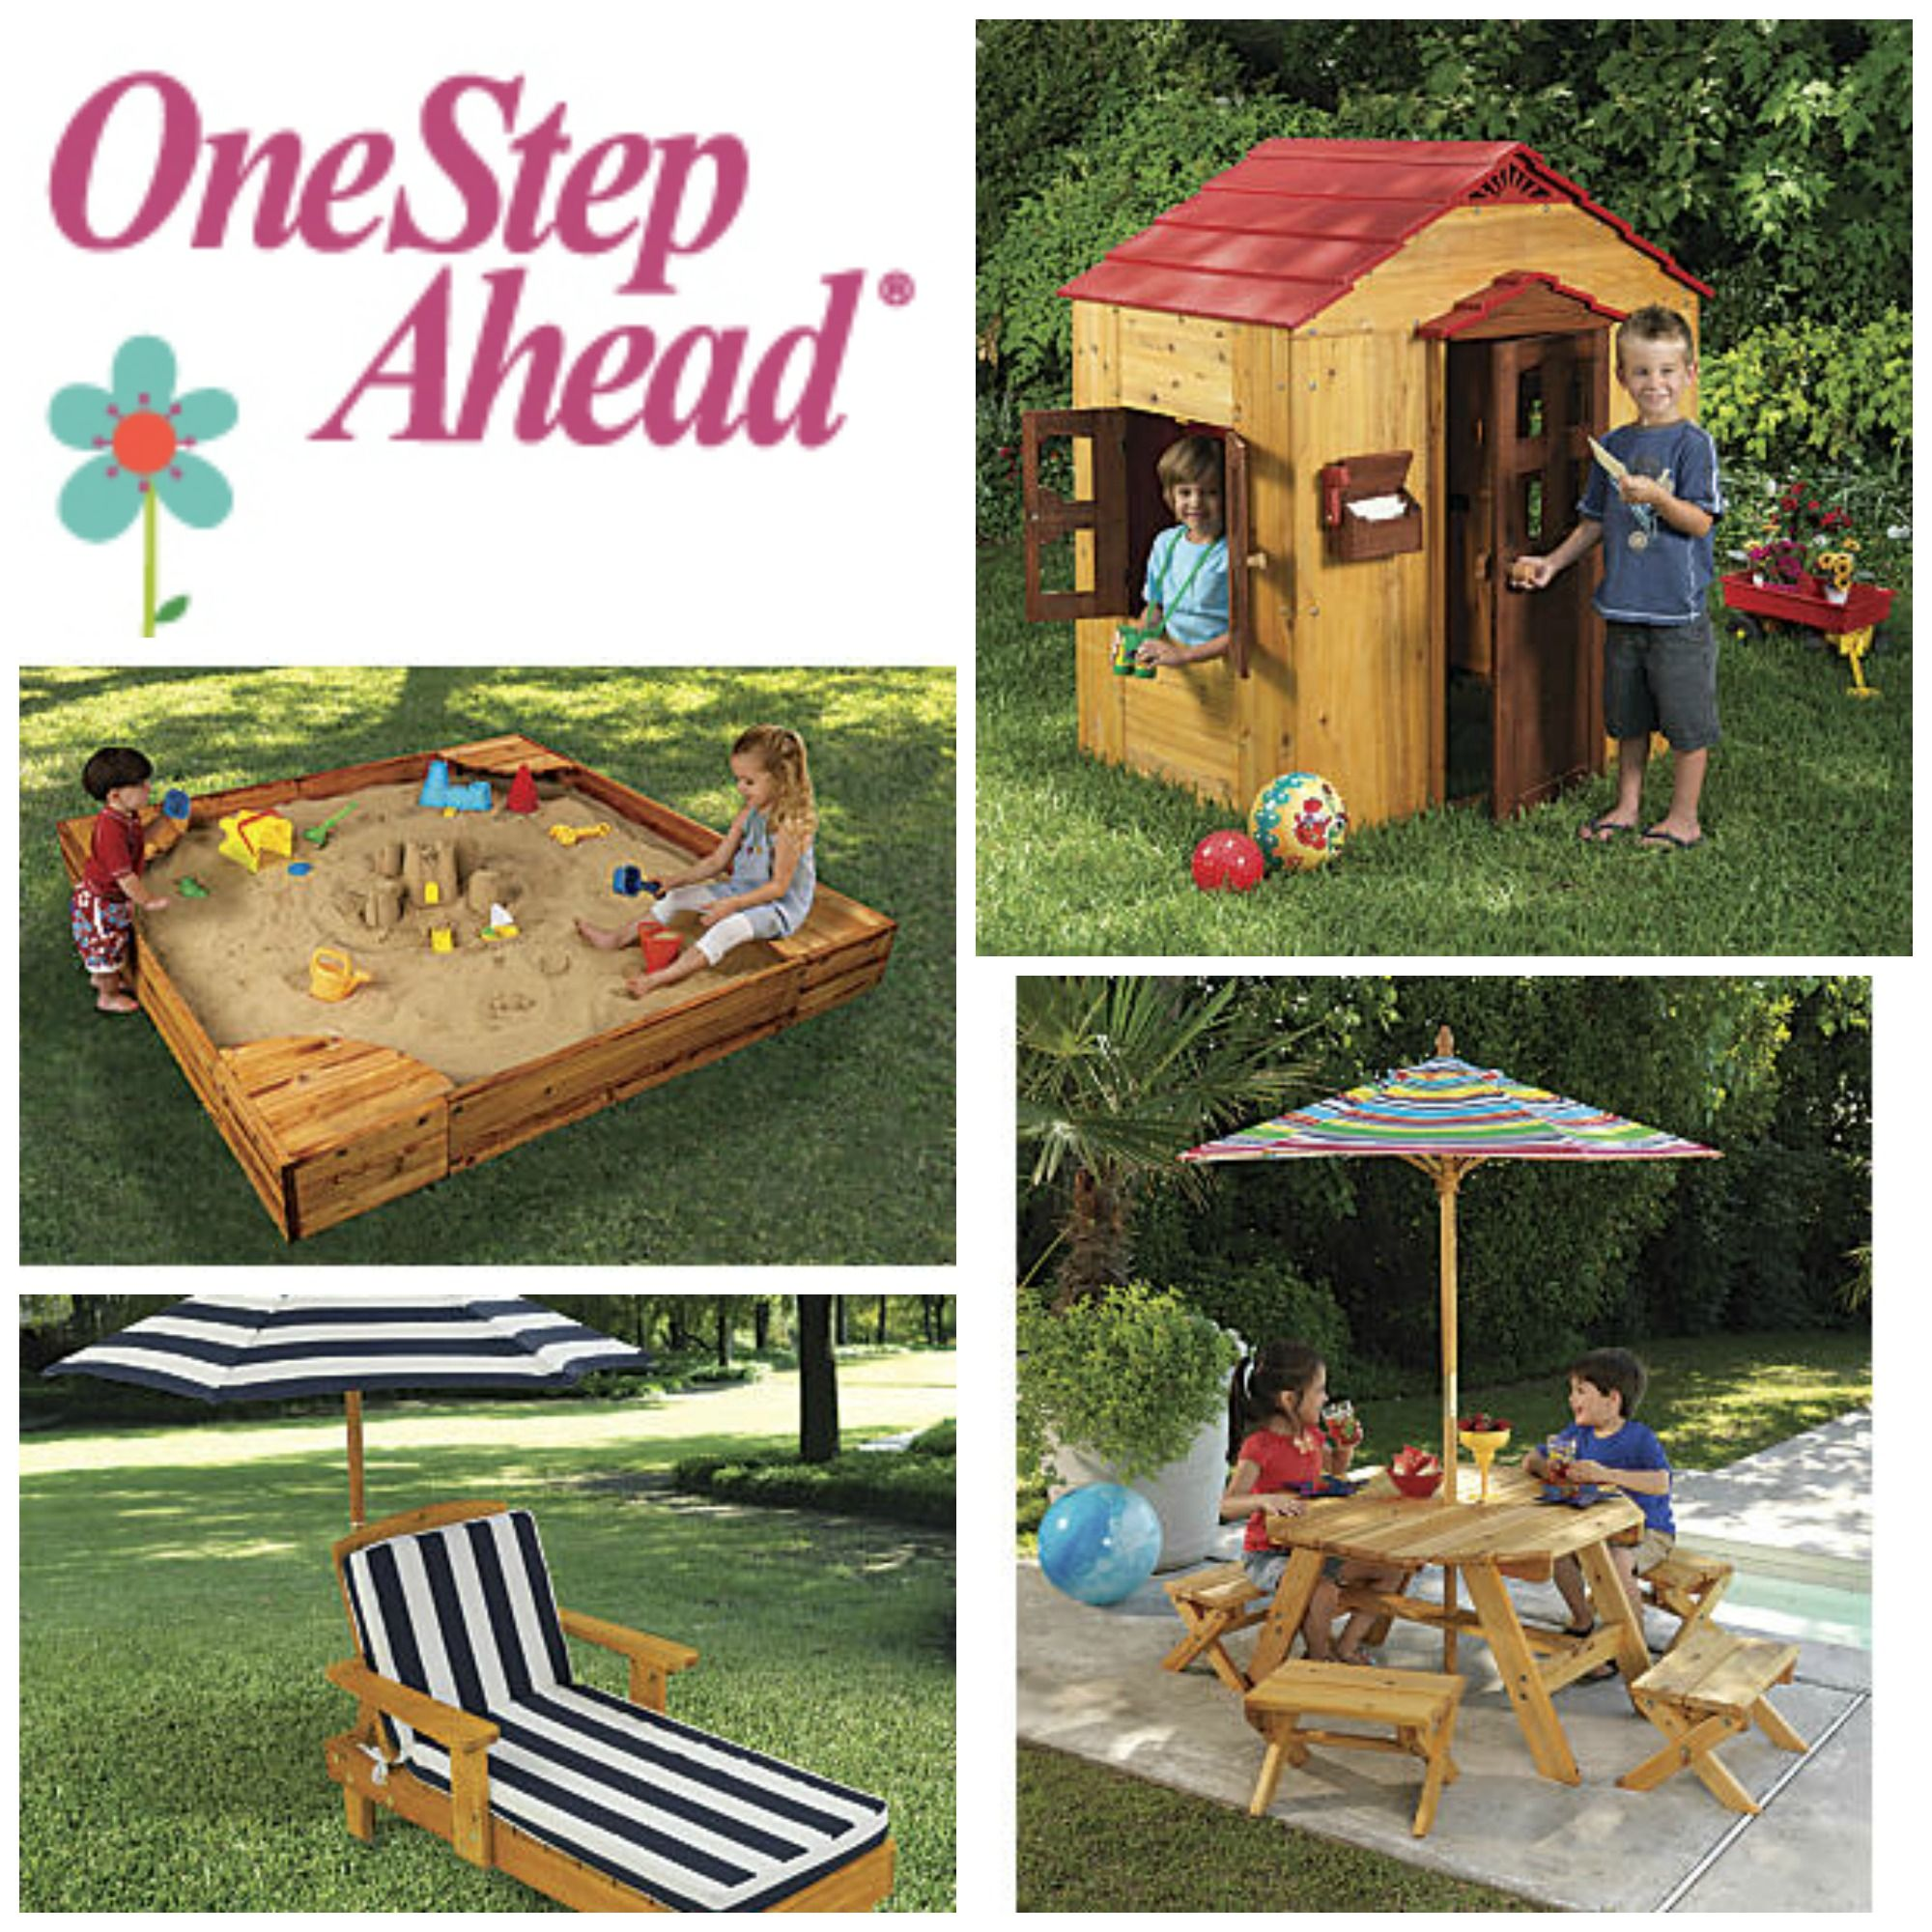 e Step Ahead KidKraft Outdoor gear & Furniture Made of high